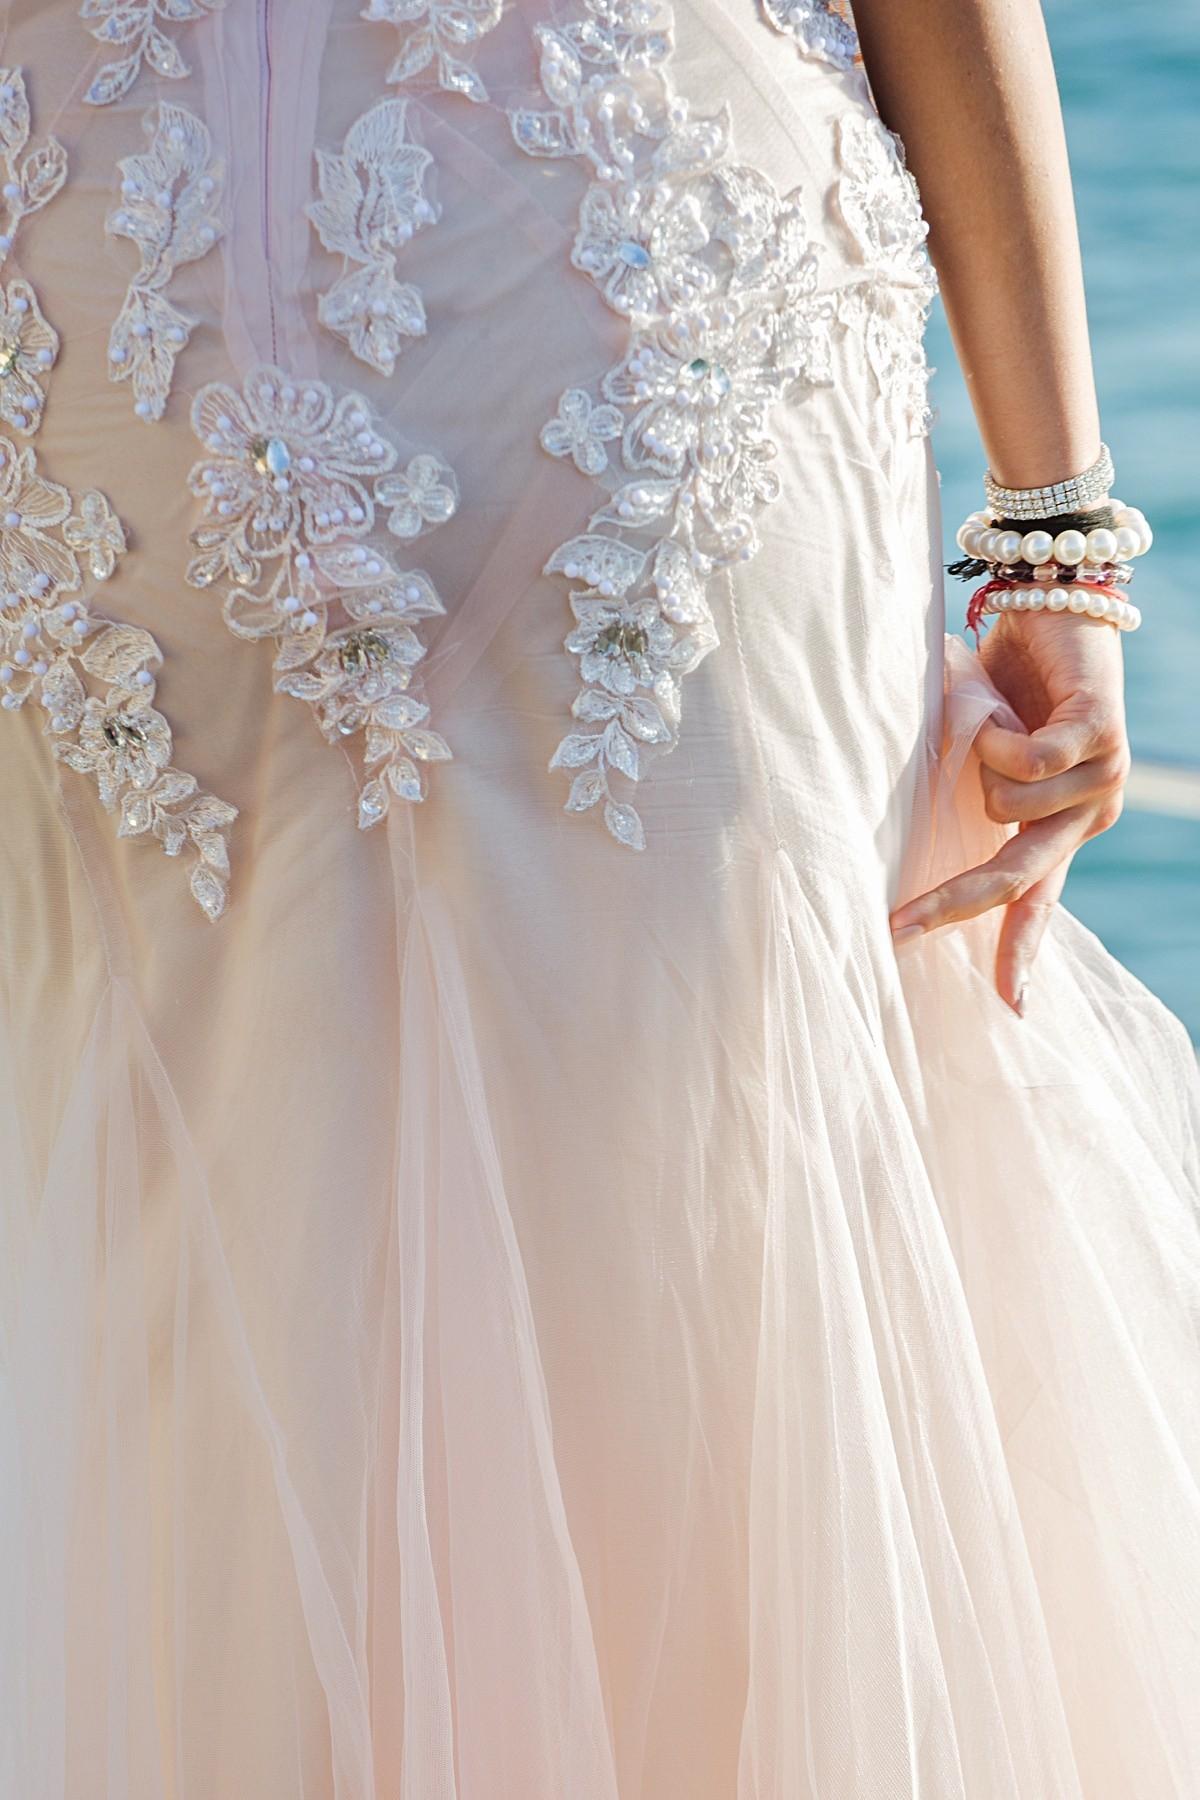 Mombasa Bridal Wedding Editorial Photo Shoot